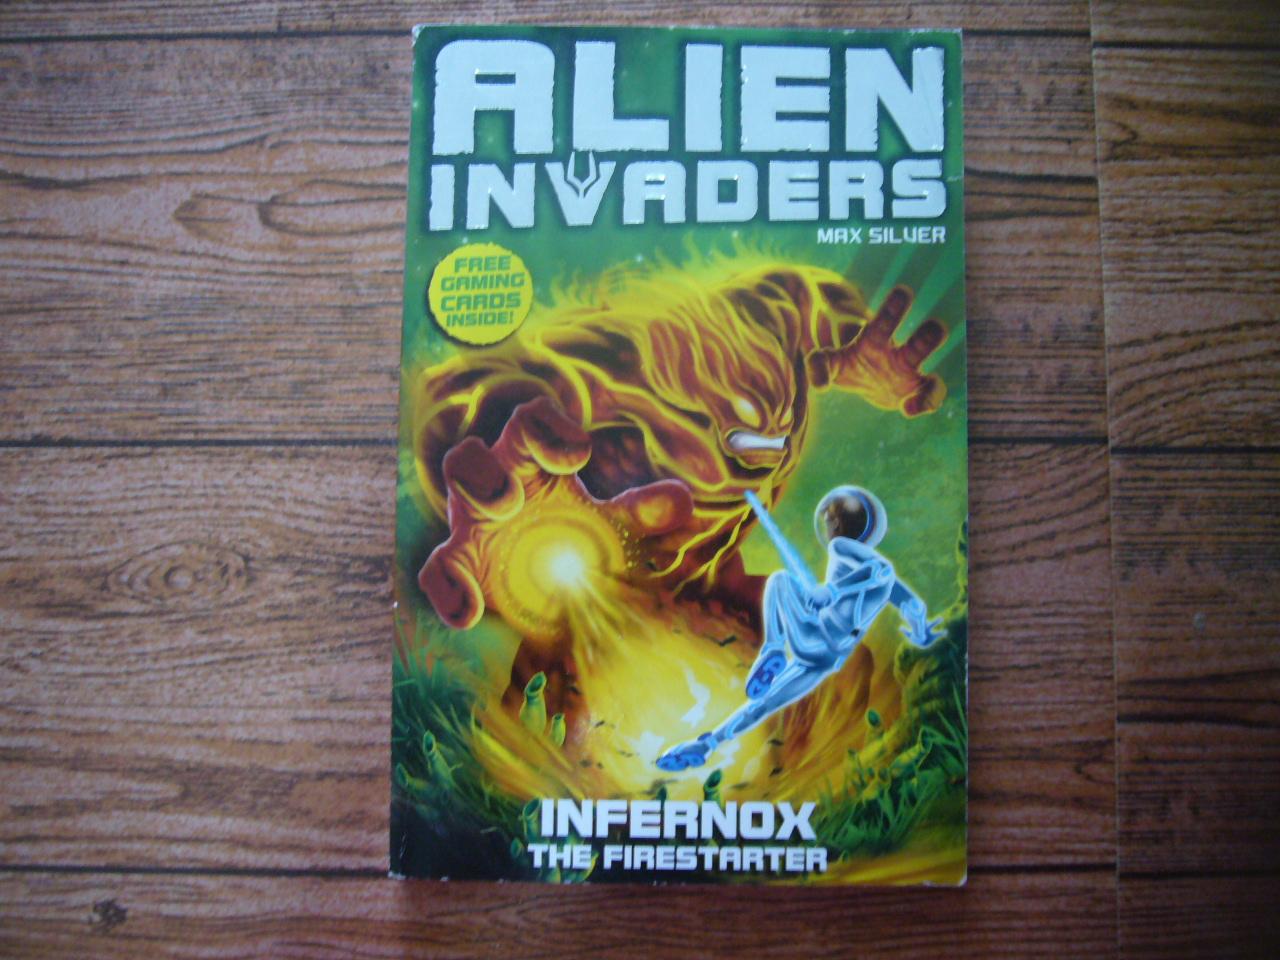 Alien Invaders 2: Infernox the Firestarter